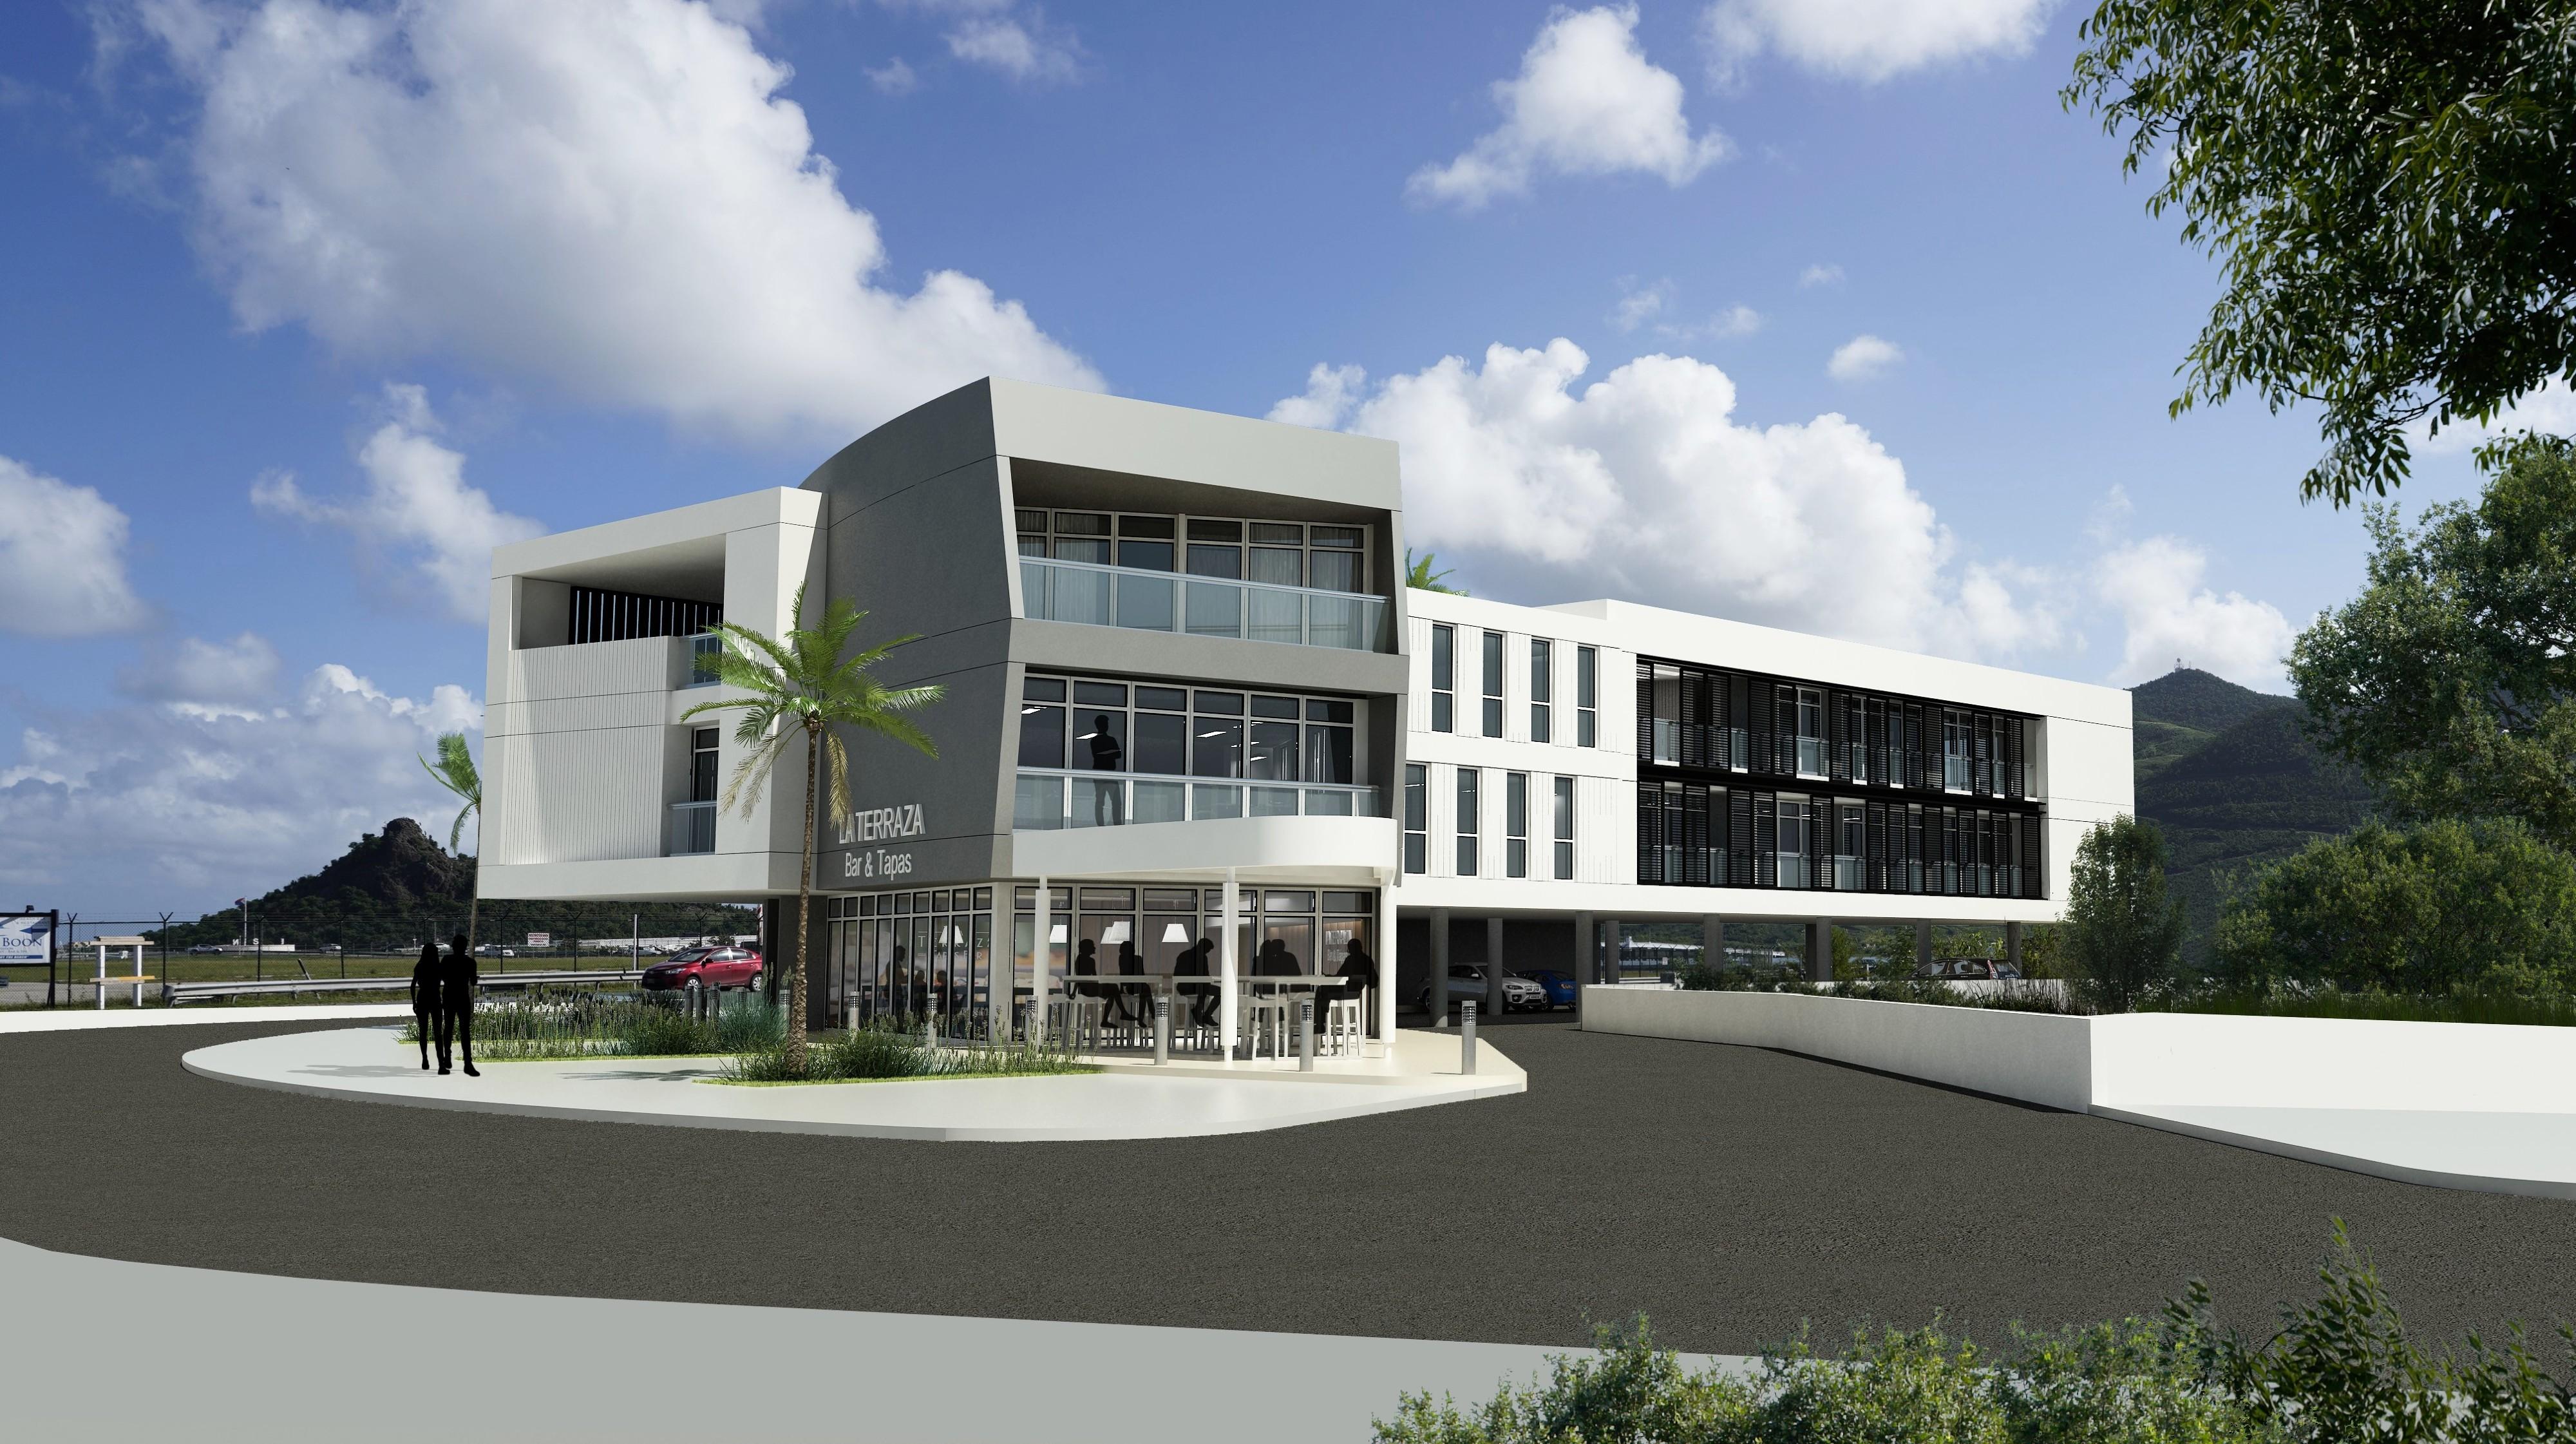 Simpson Bay Commercial & Residential Building - eb081-01-render.jpg